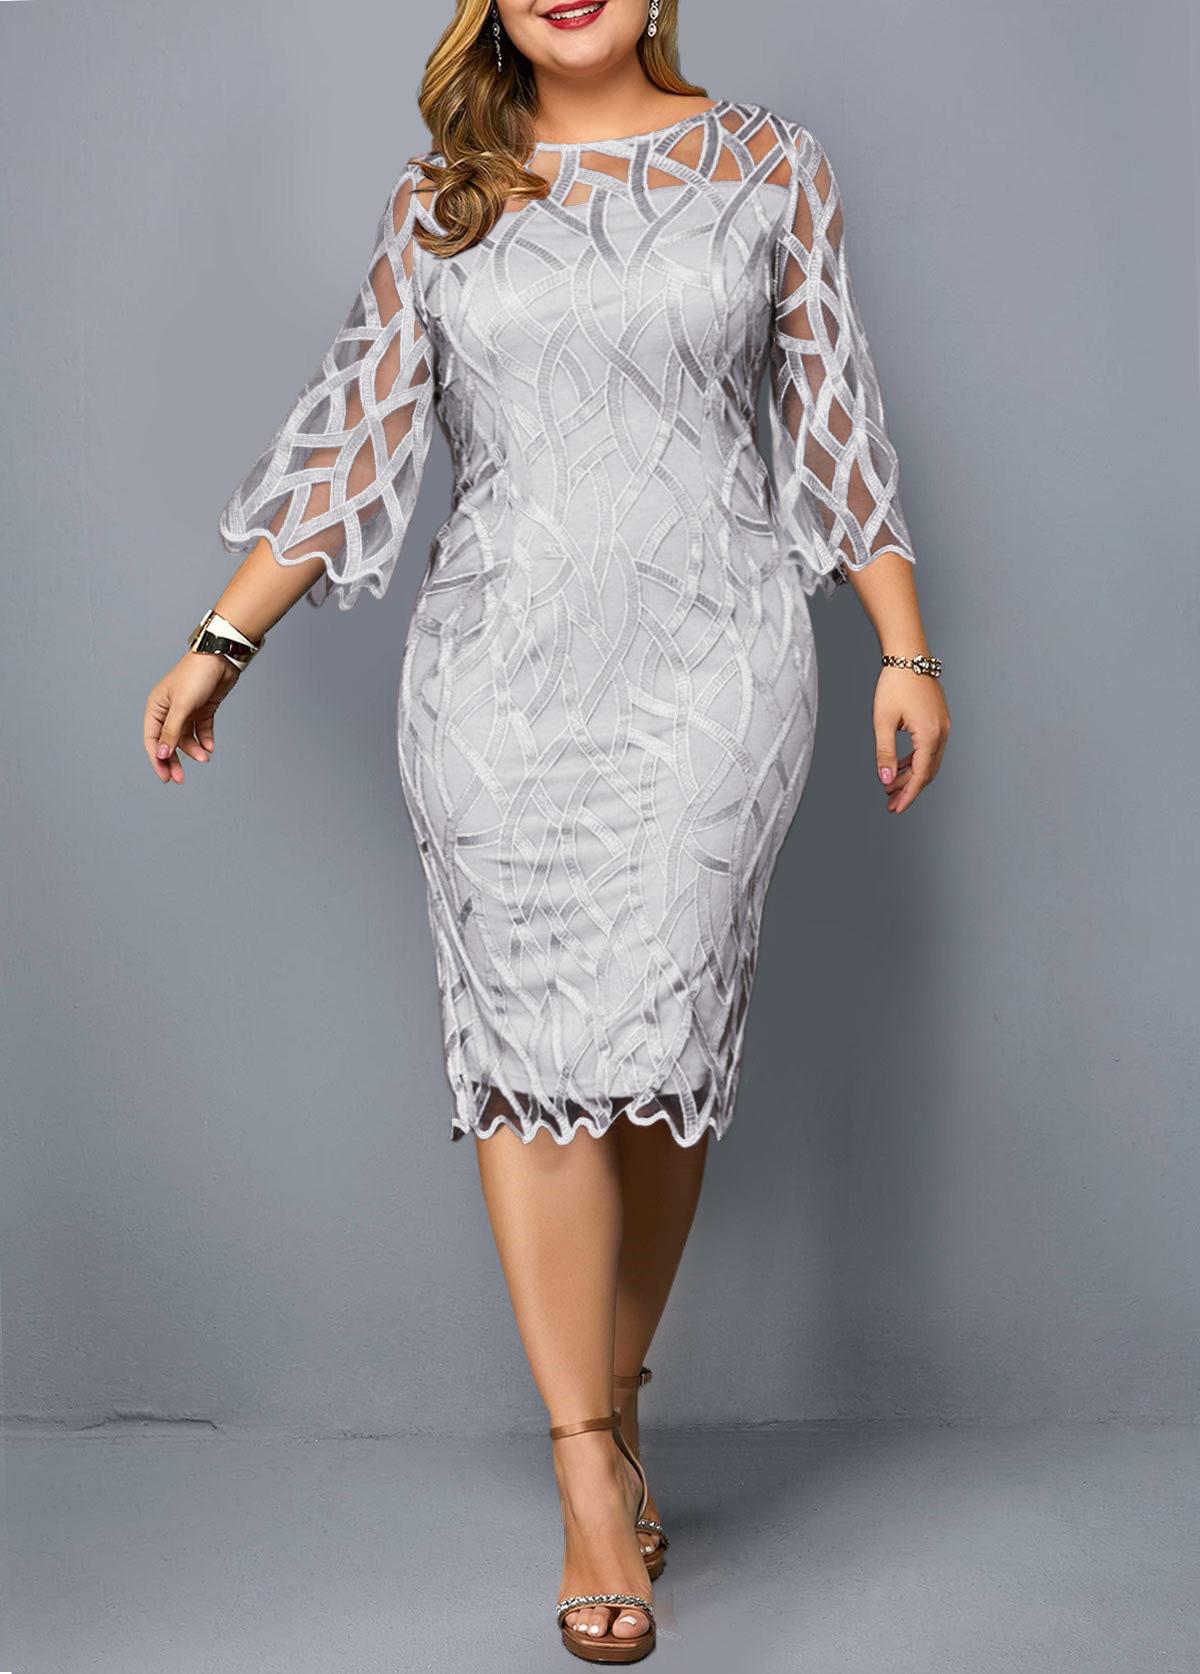 Round Neck 3/4 Sleeve Plus Size Dress